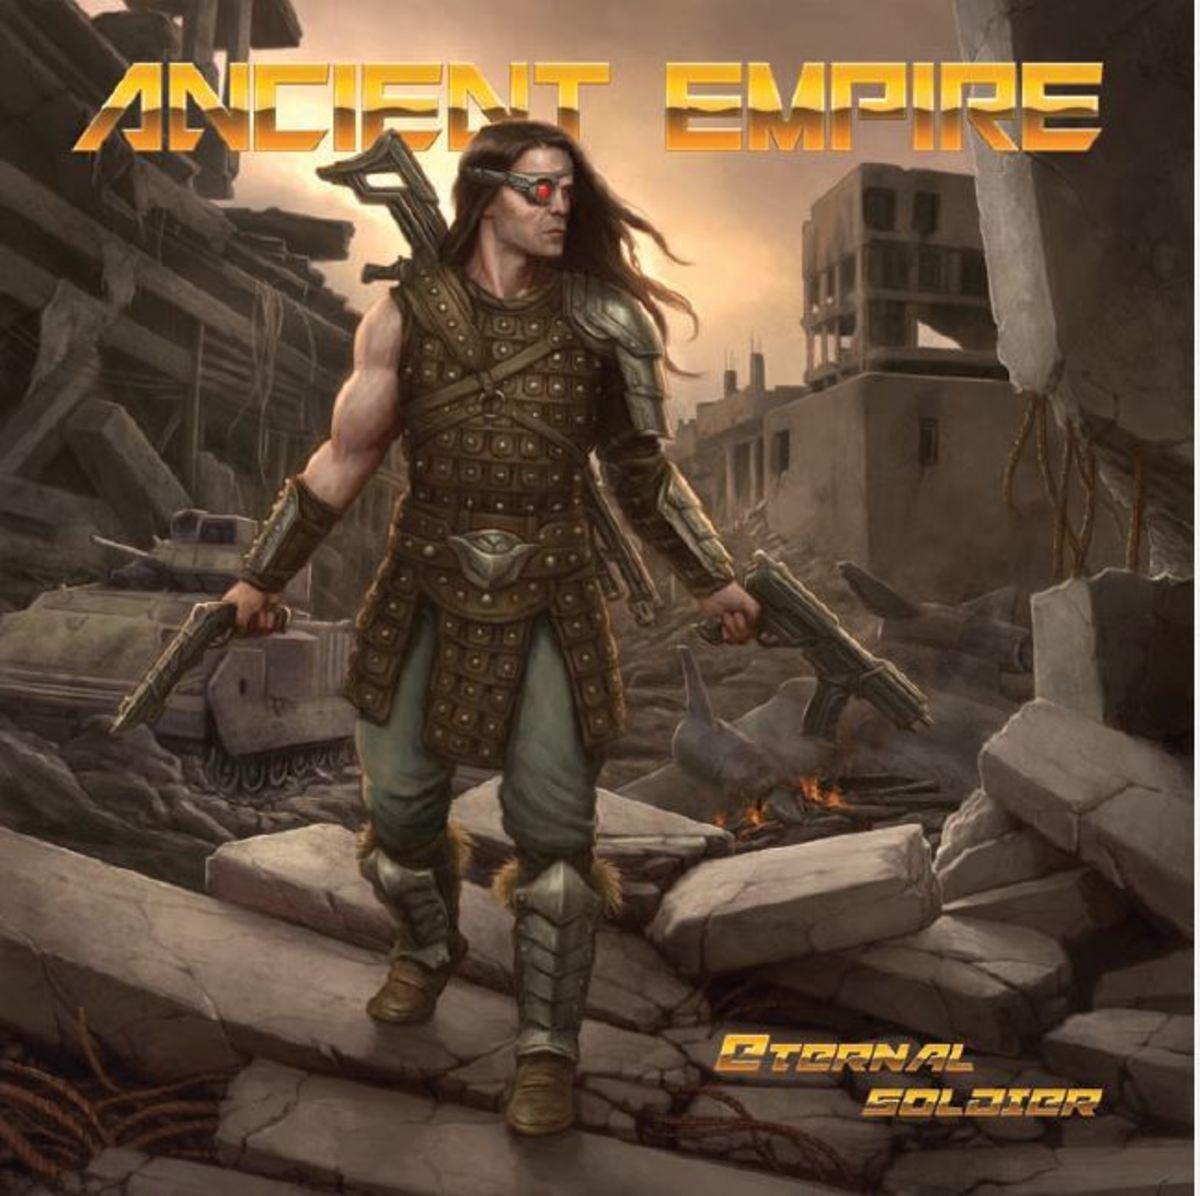 Ancient Empire,